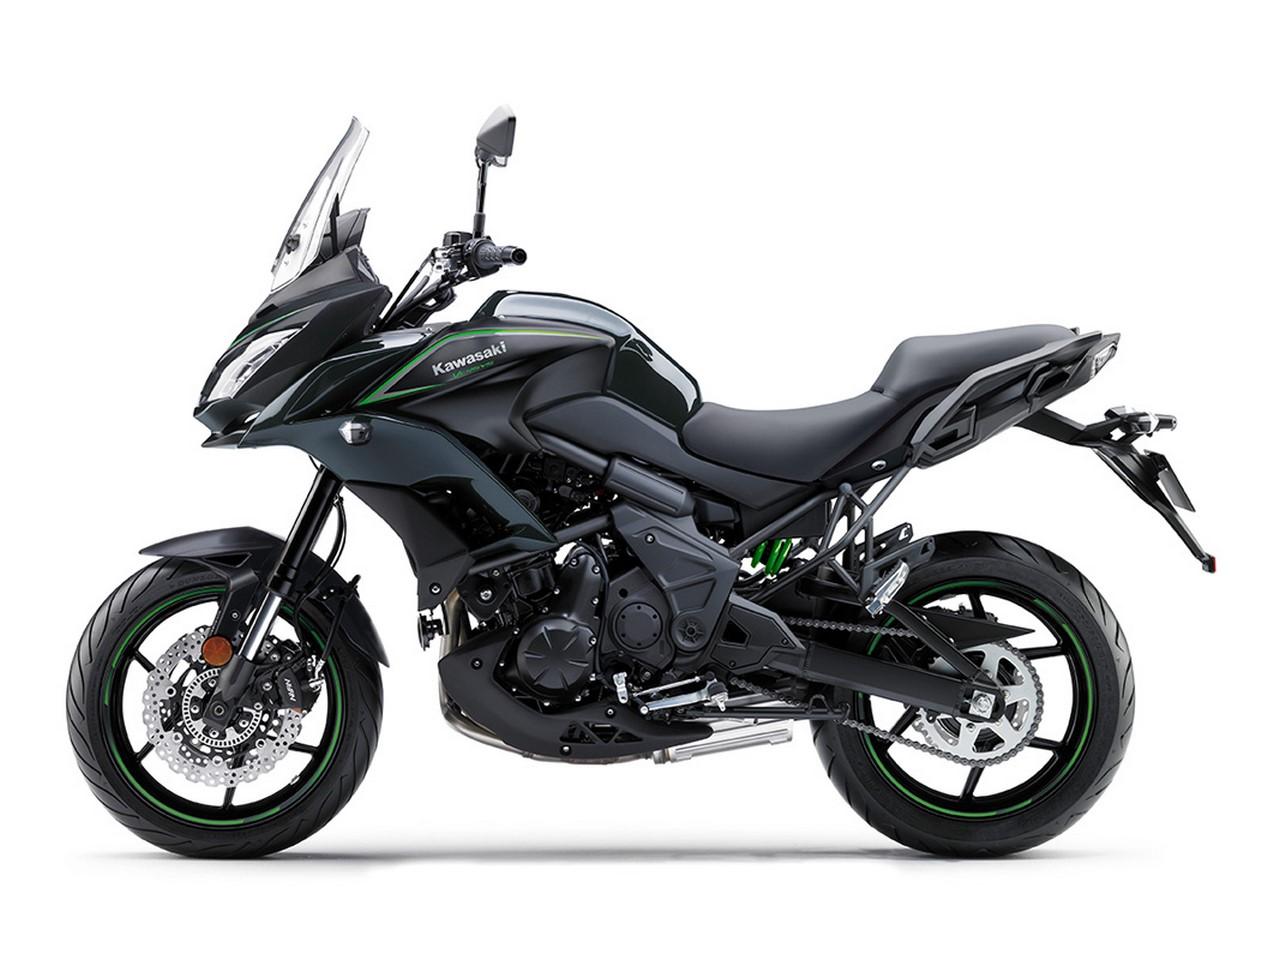 Kawasaki Versy 650 black 2017 side left